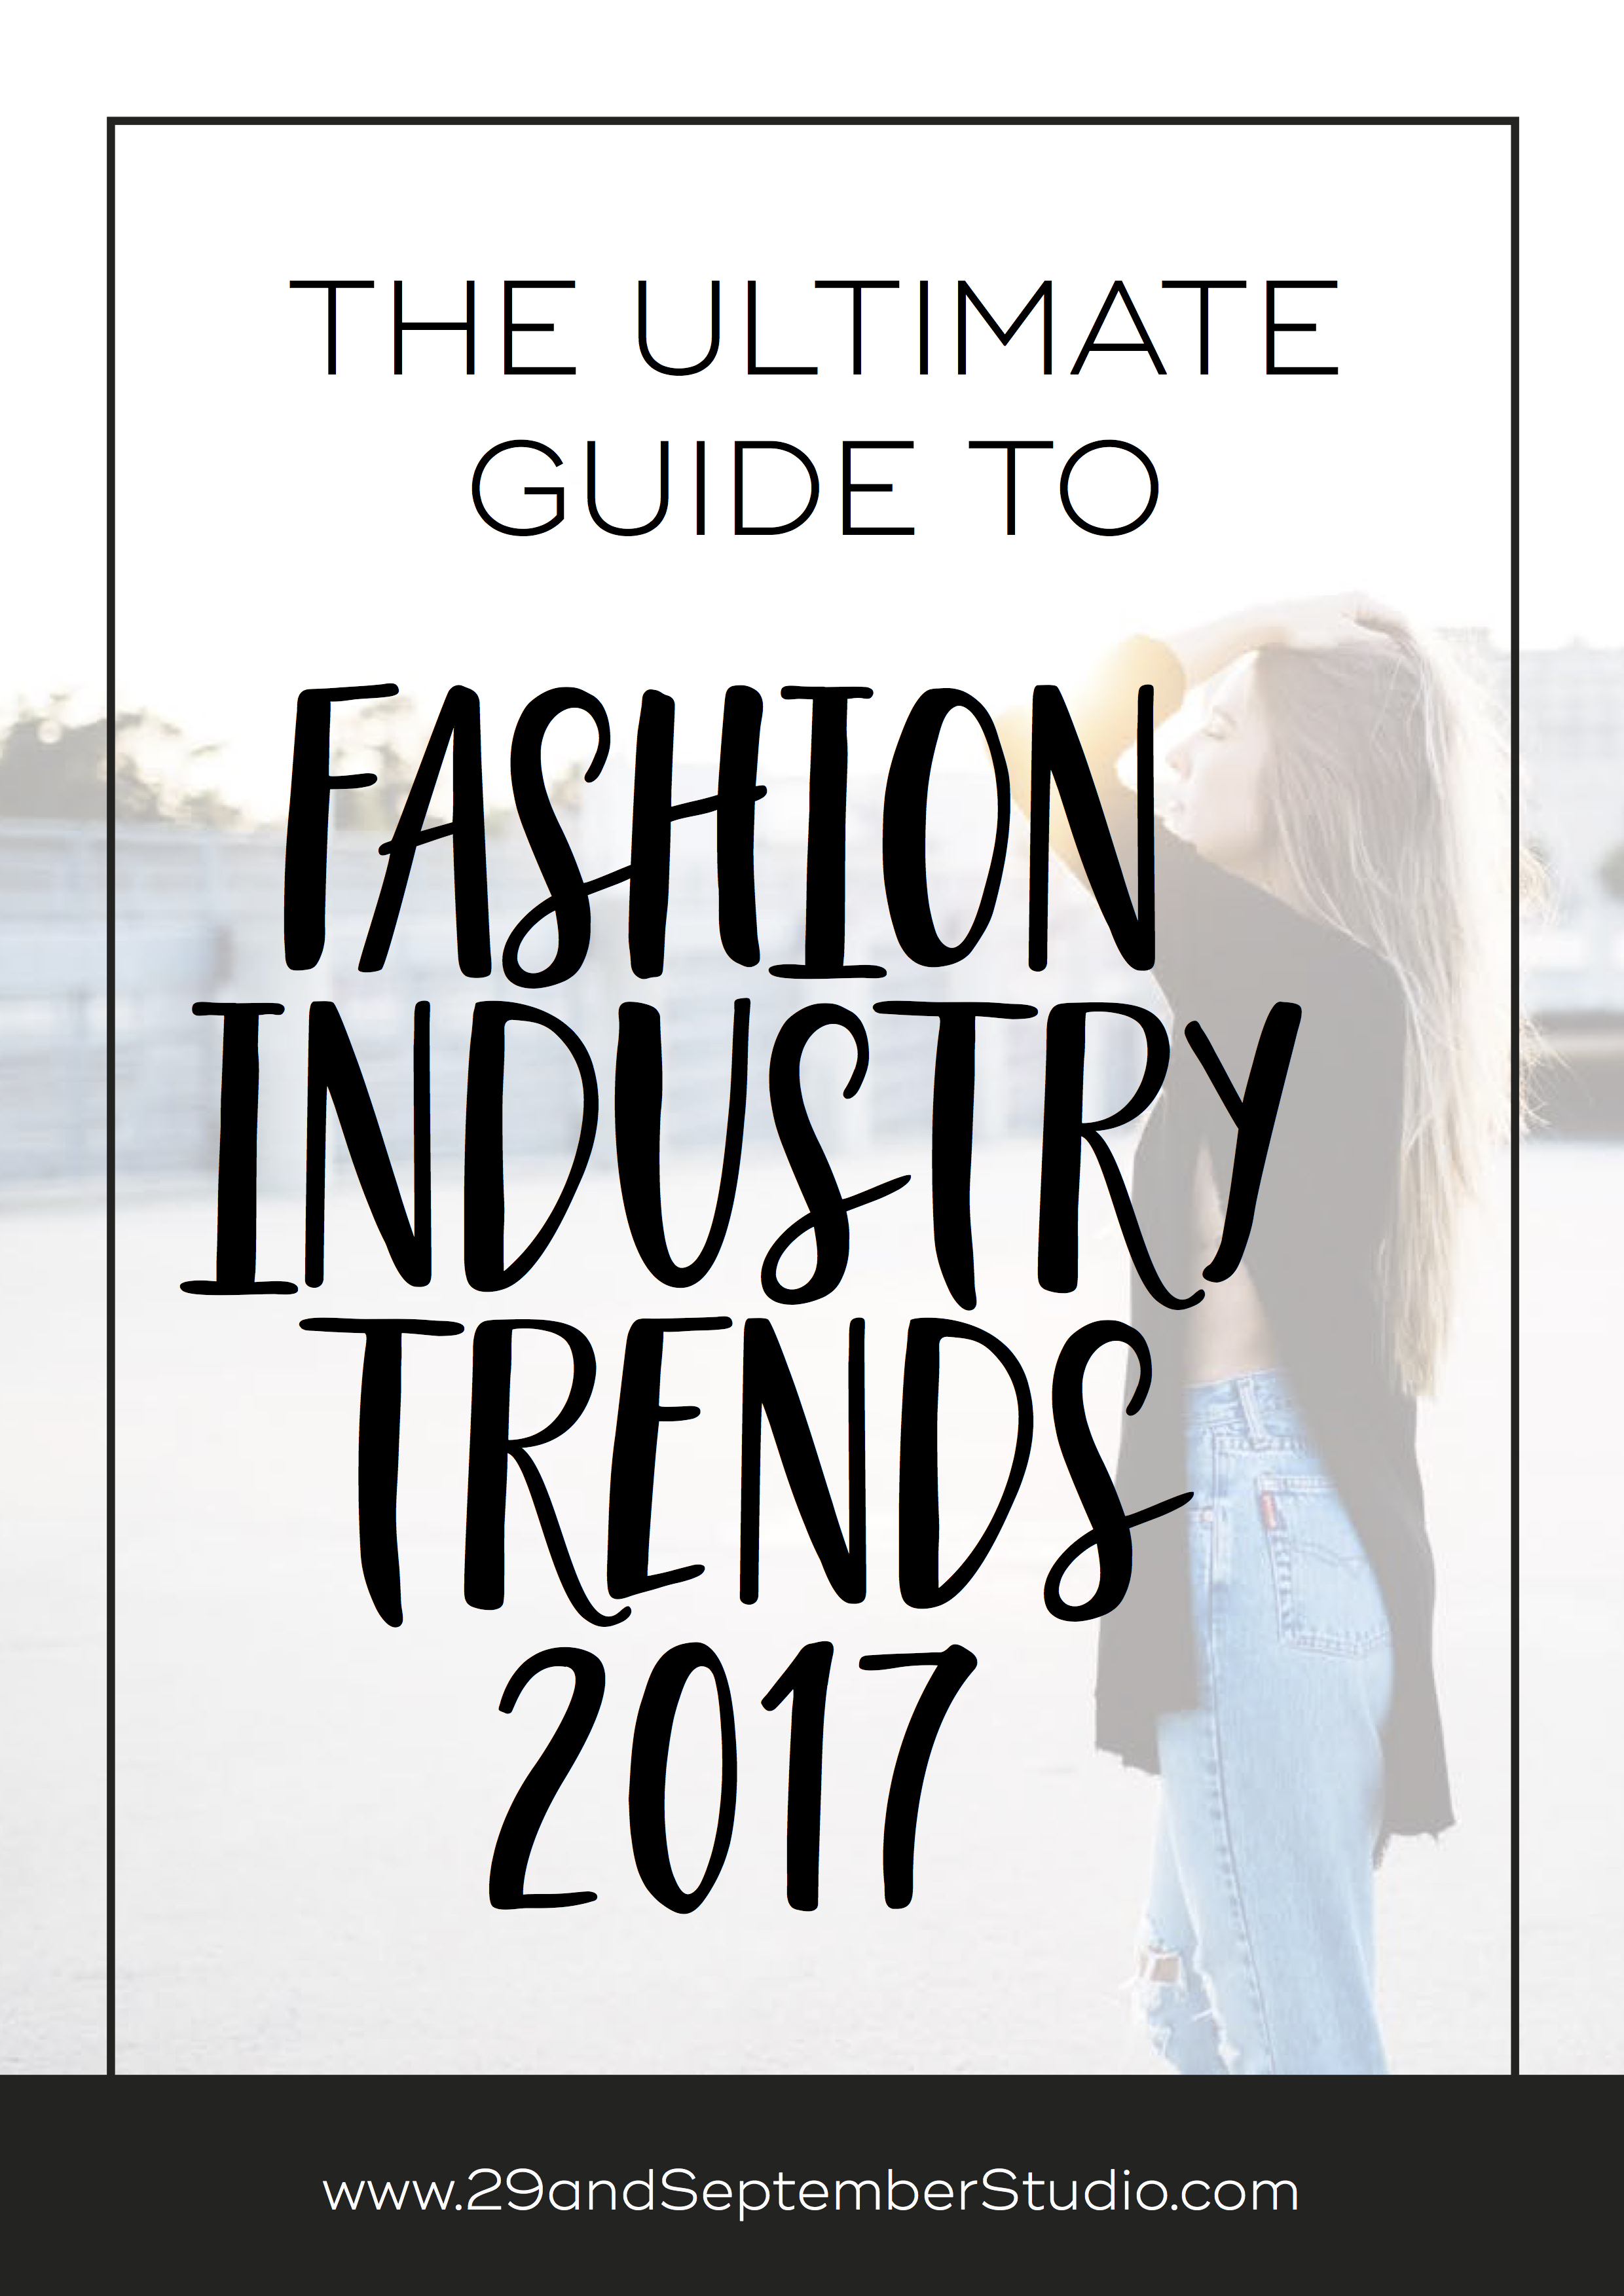 Fashion trends copy.jpg